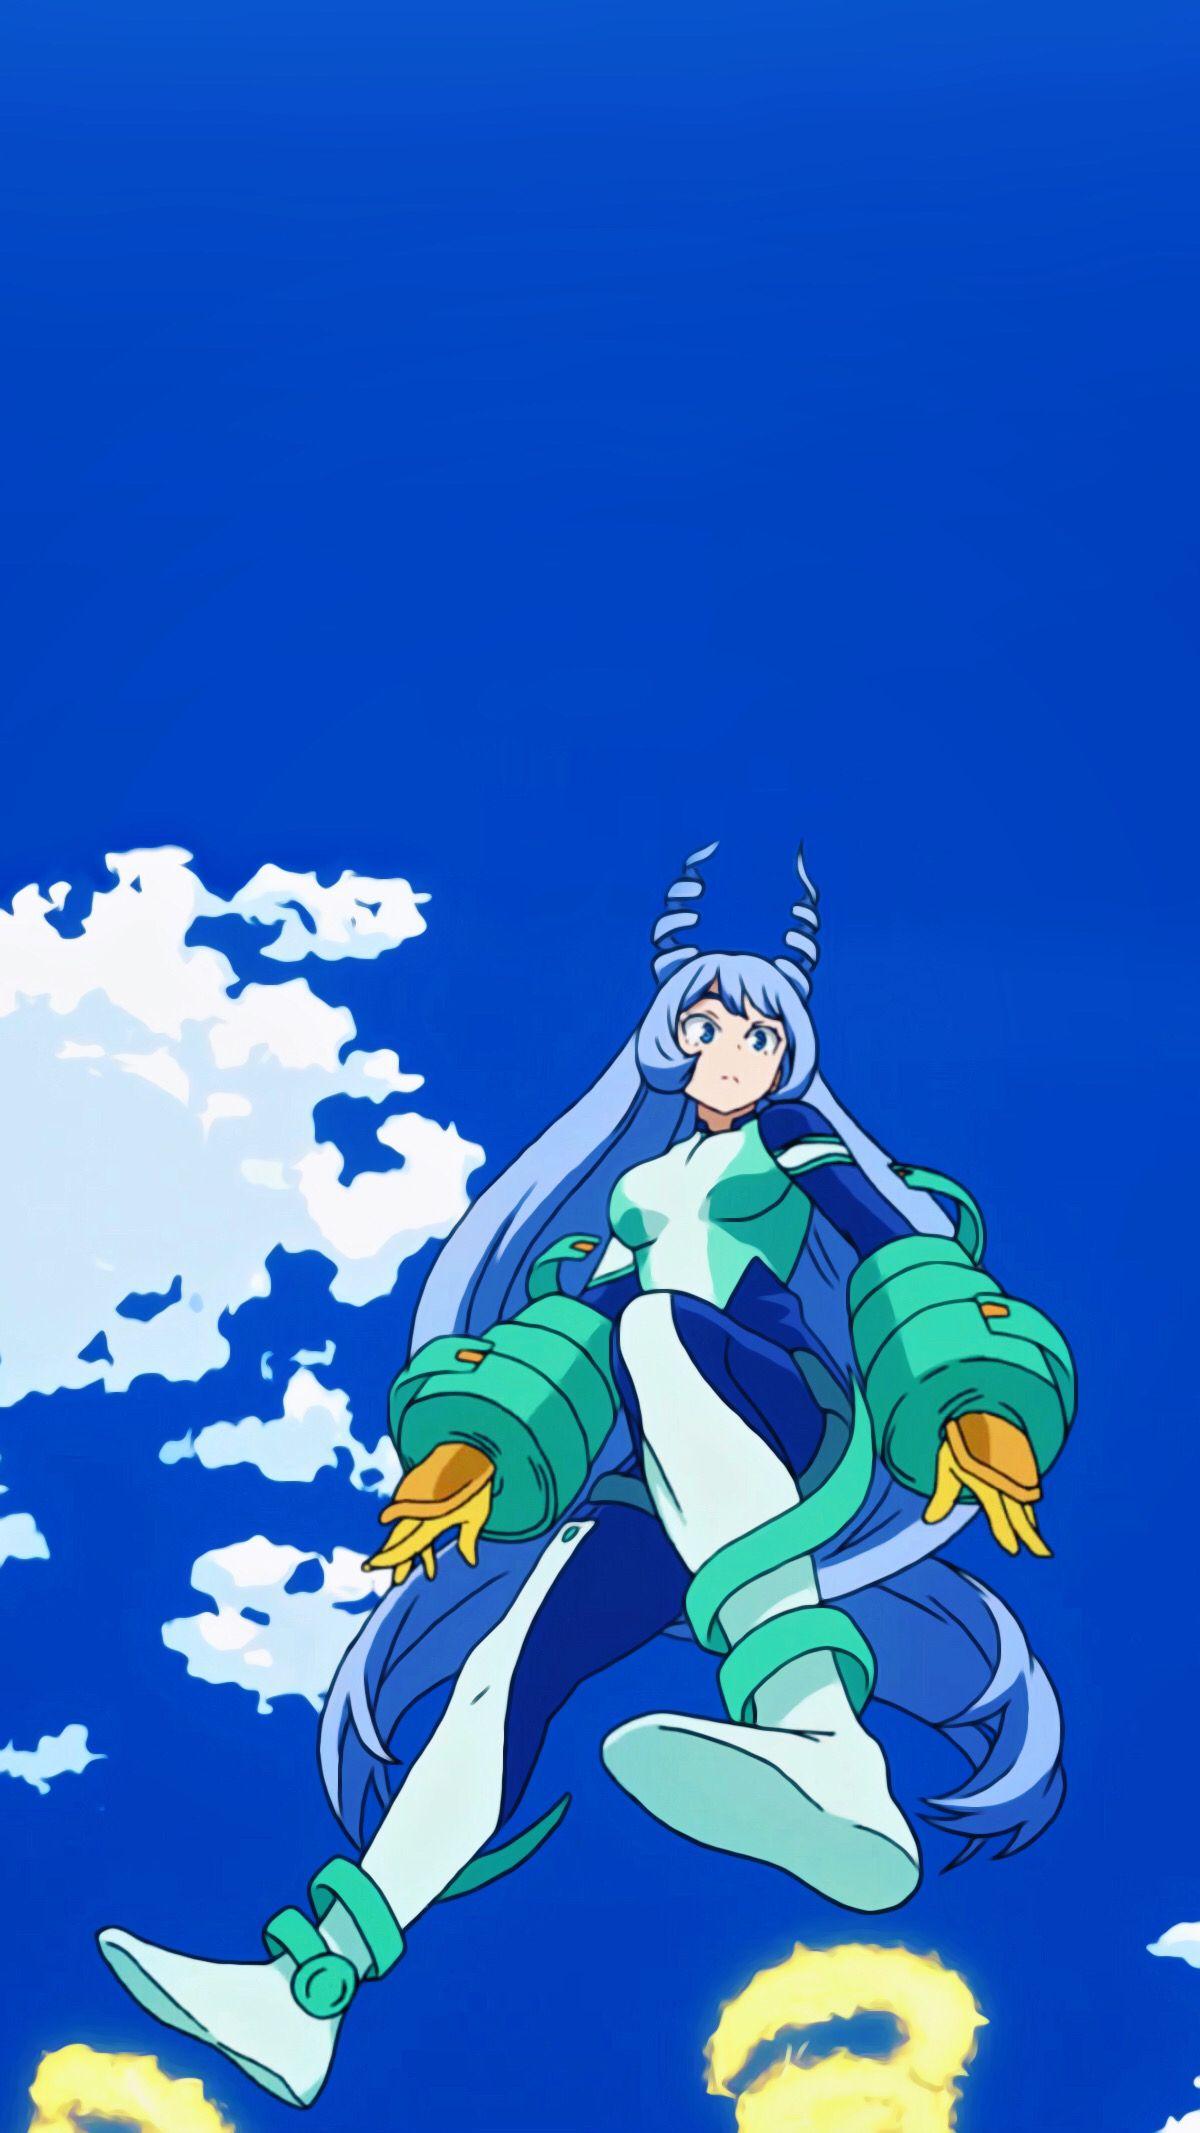 Nejire Hado Aesthetic Wallpaper Anime Character Drawing Kawaii Anime Hero Academia Characters